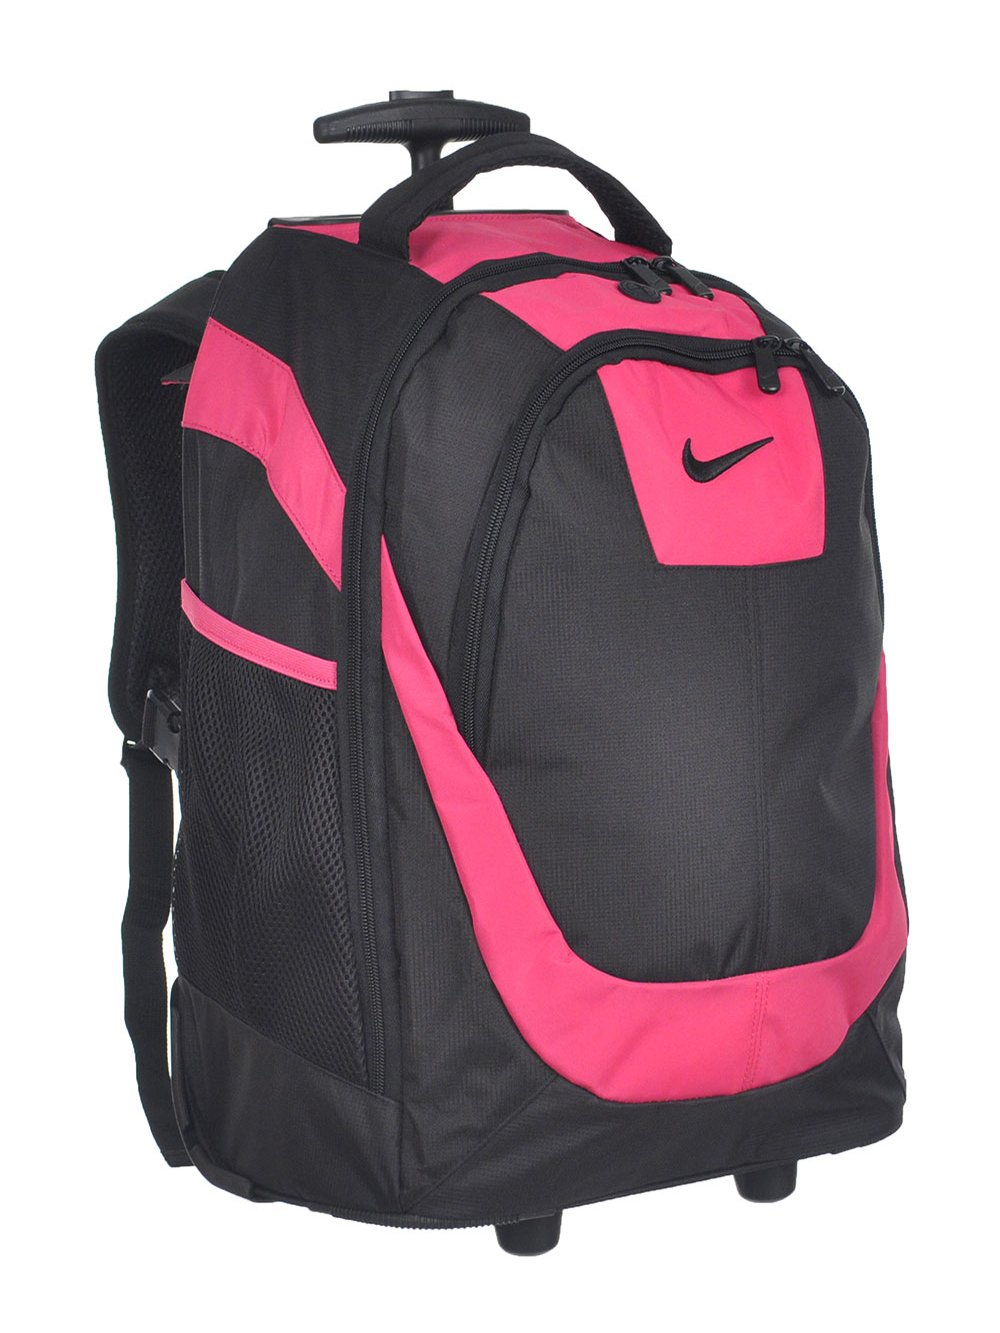 Nike Swoosh Rolling Backpack - Purple by Nike